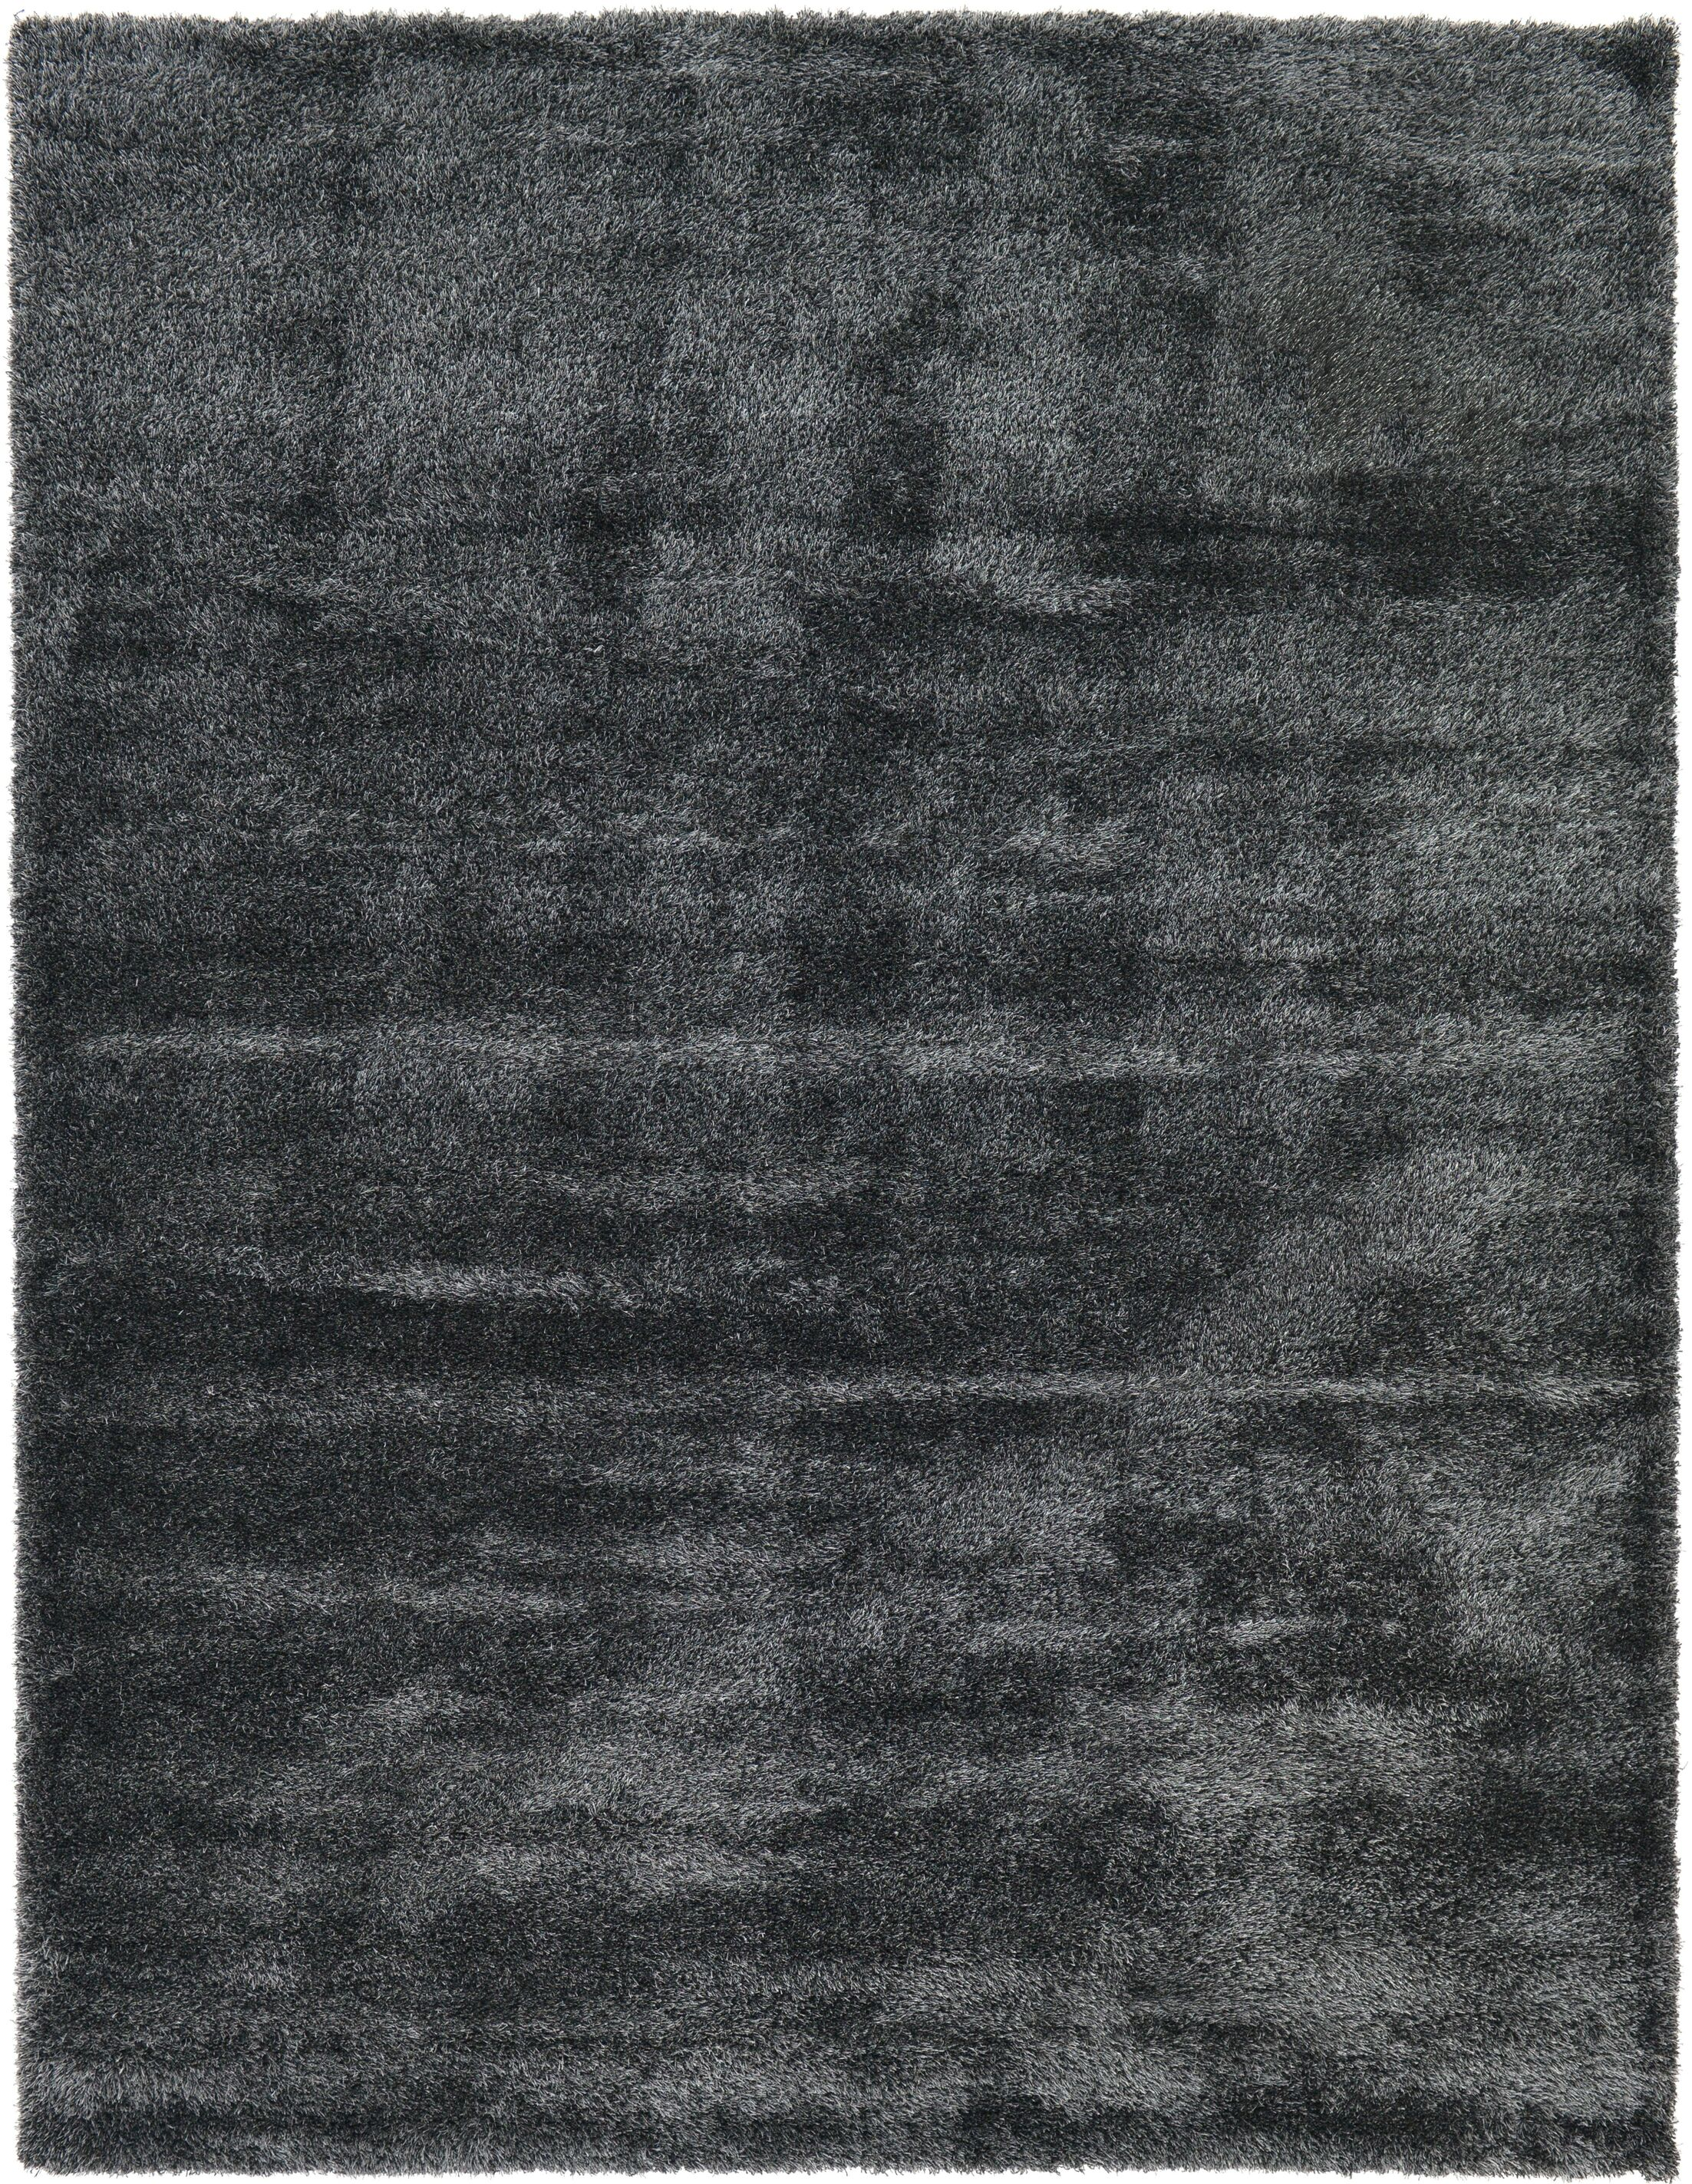 Evelyn Black Area Rug Rug Size: Rectangle 10' x 13'